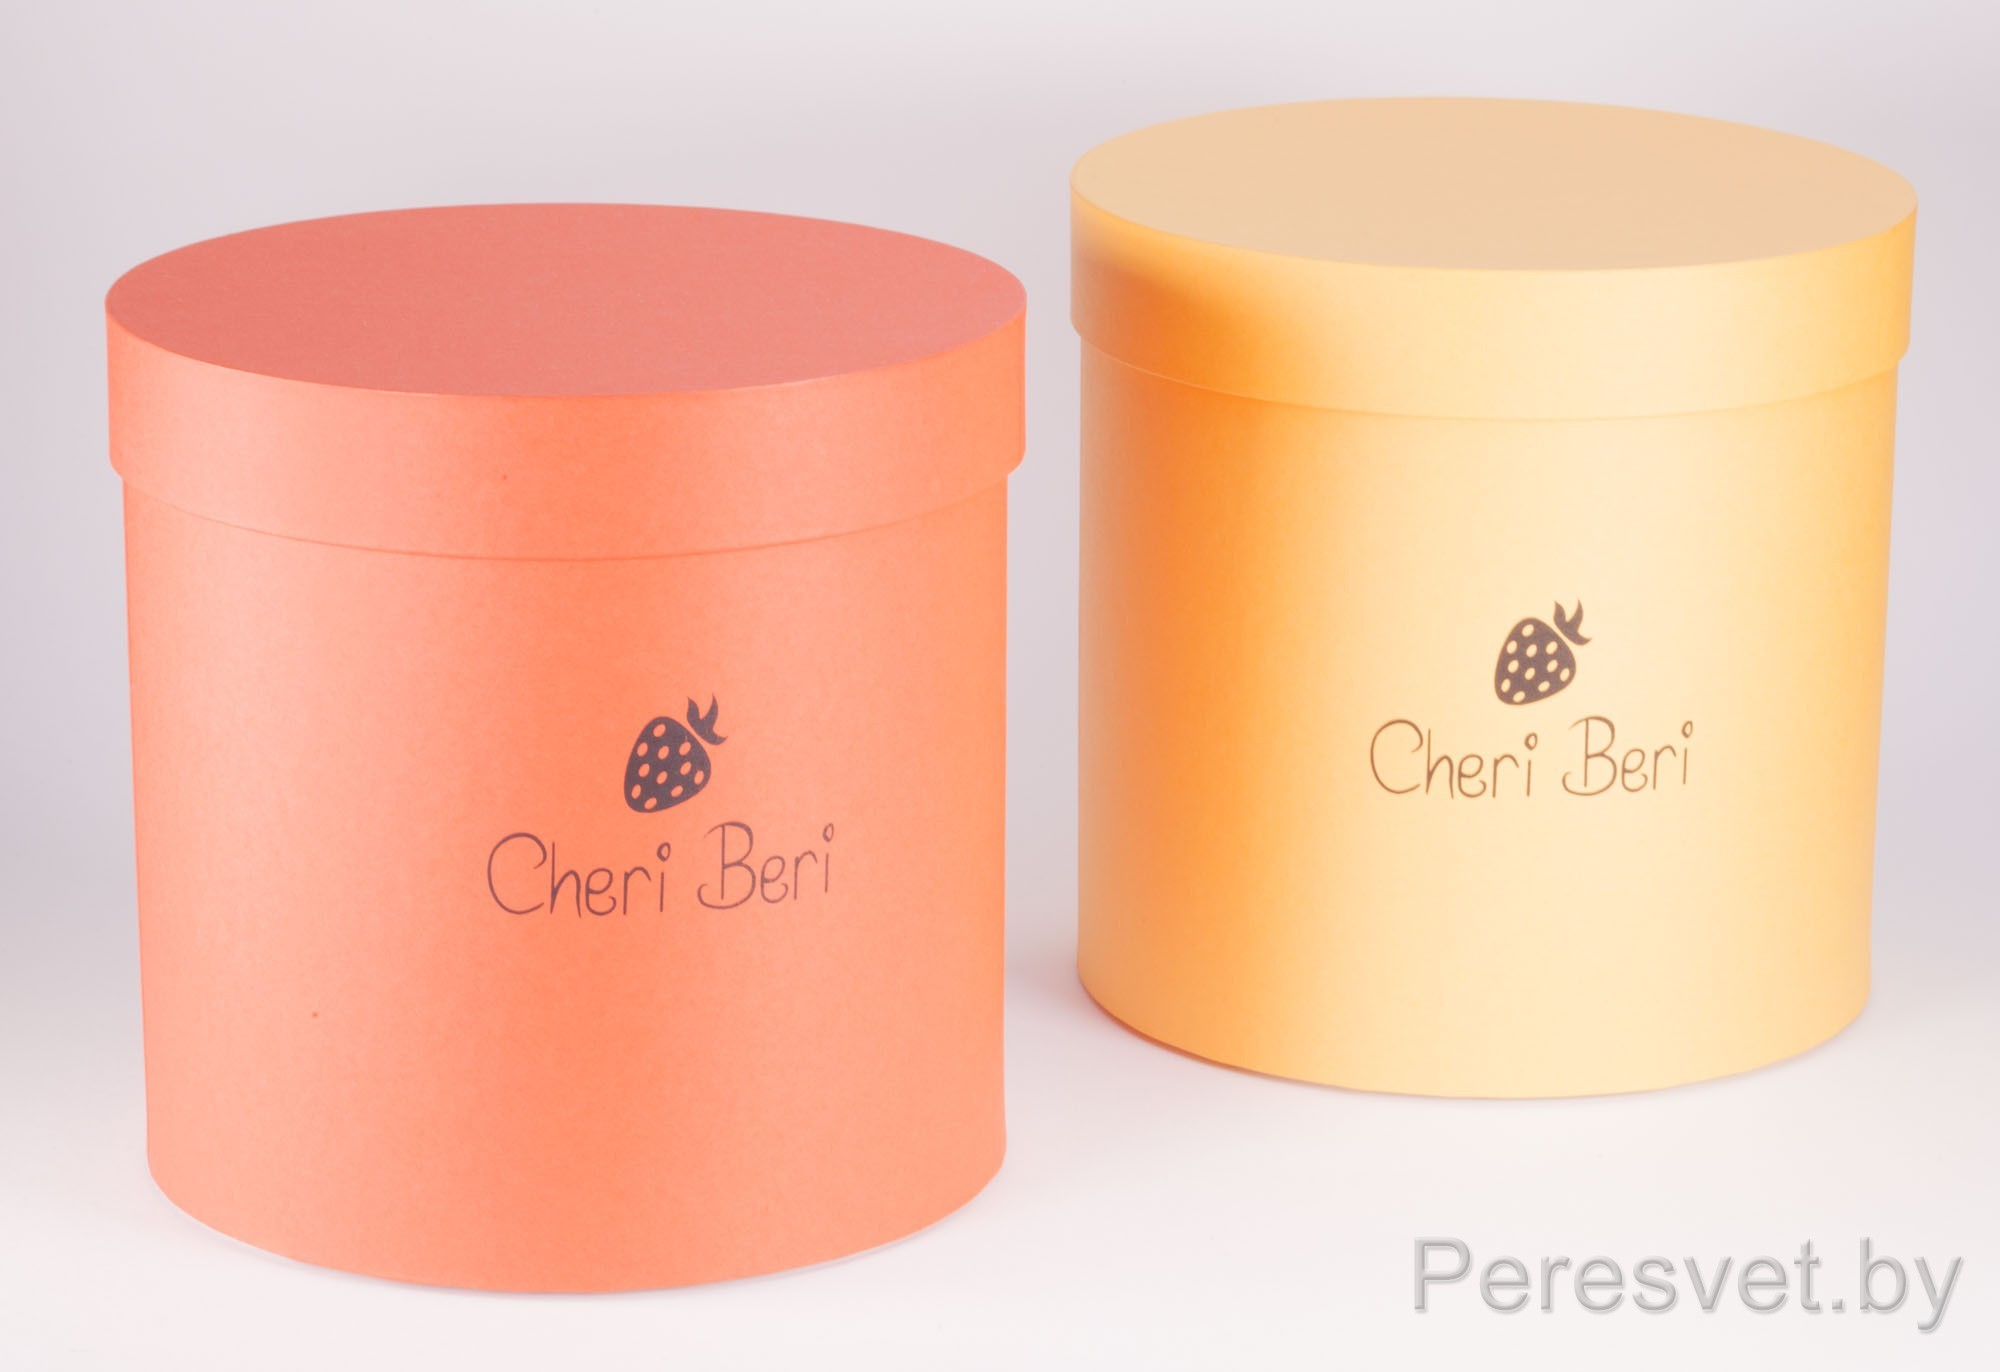 Подарочная упаковка шляпница с логотипом опт на peresvet.by